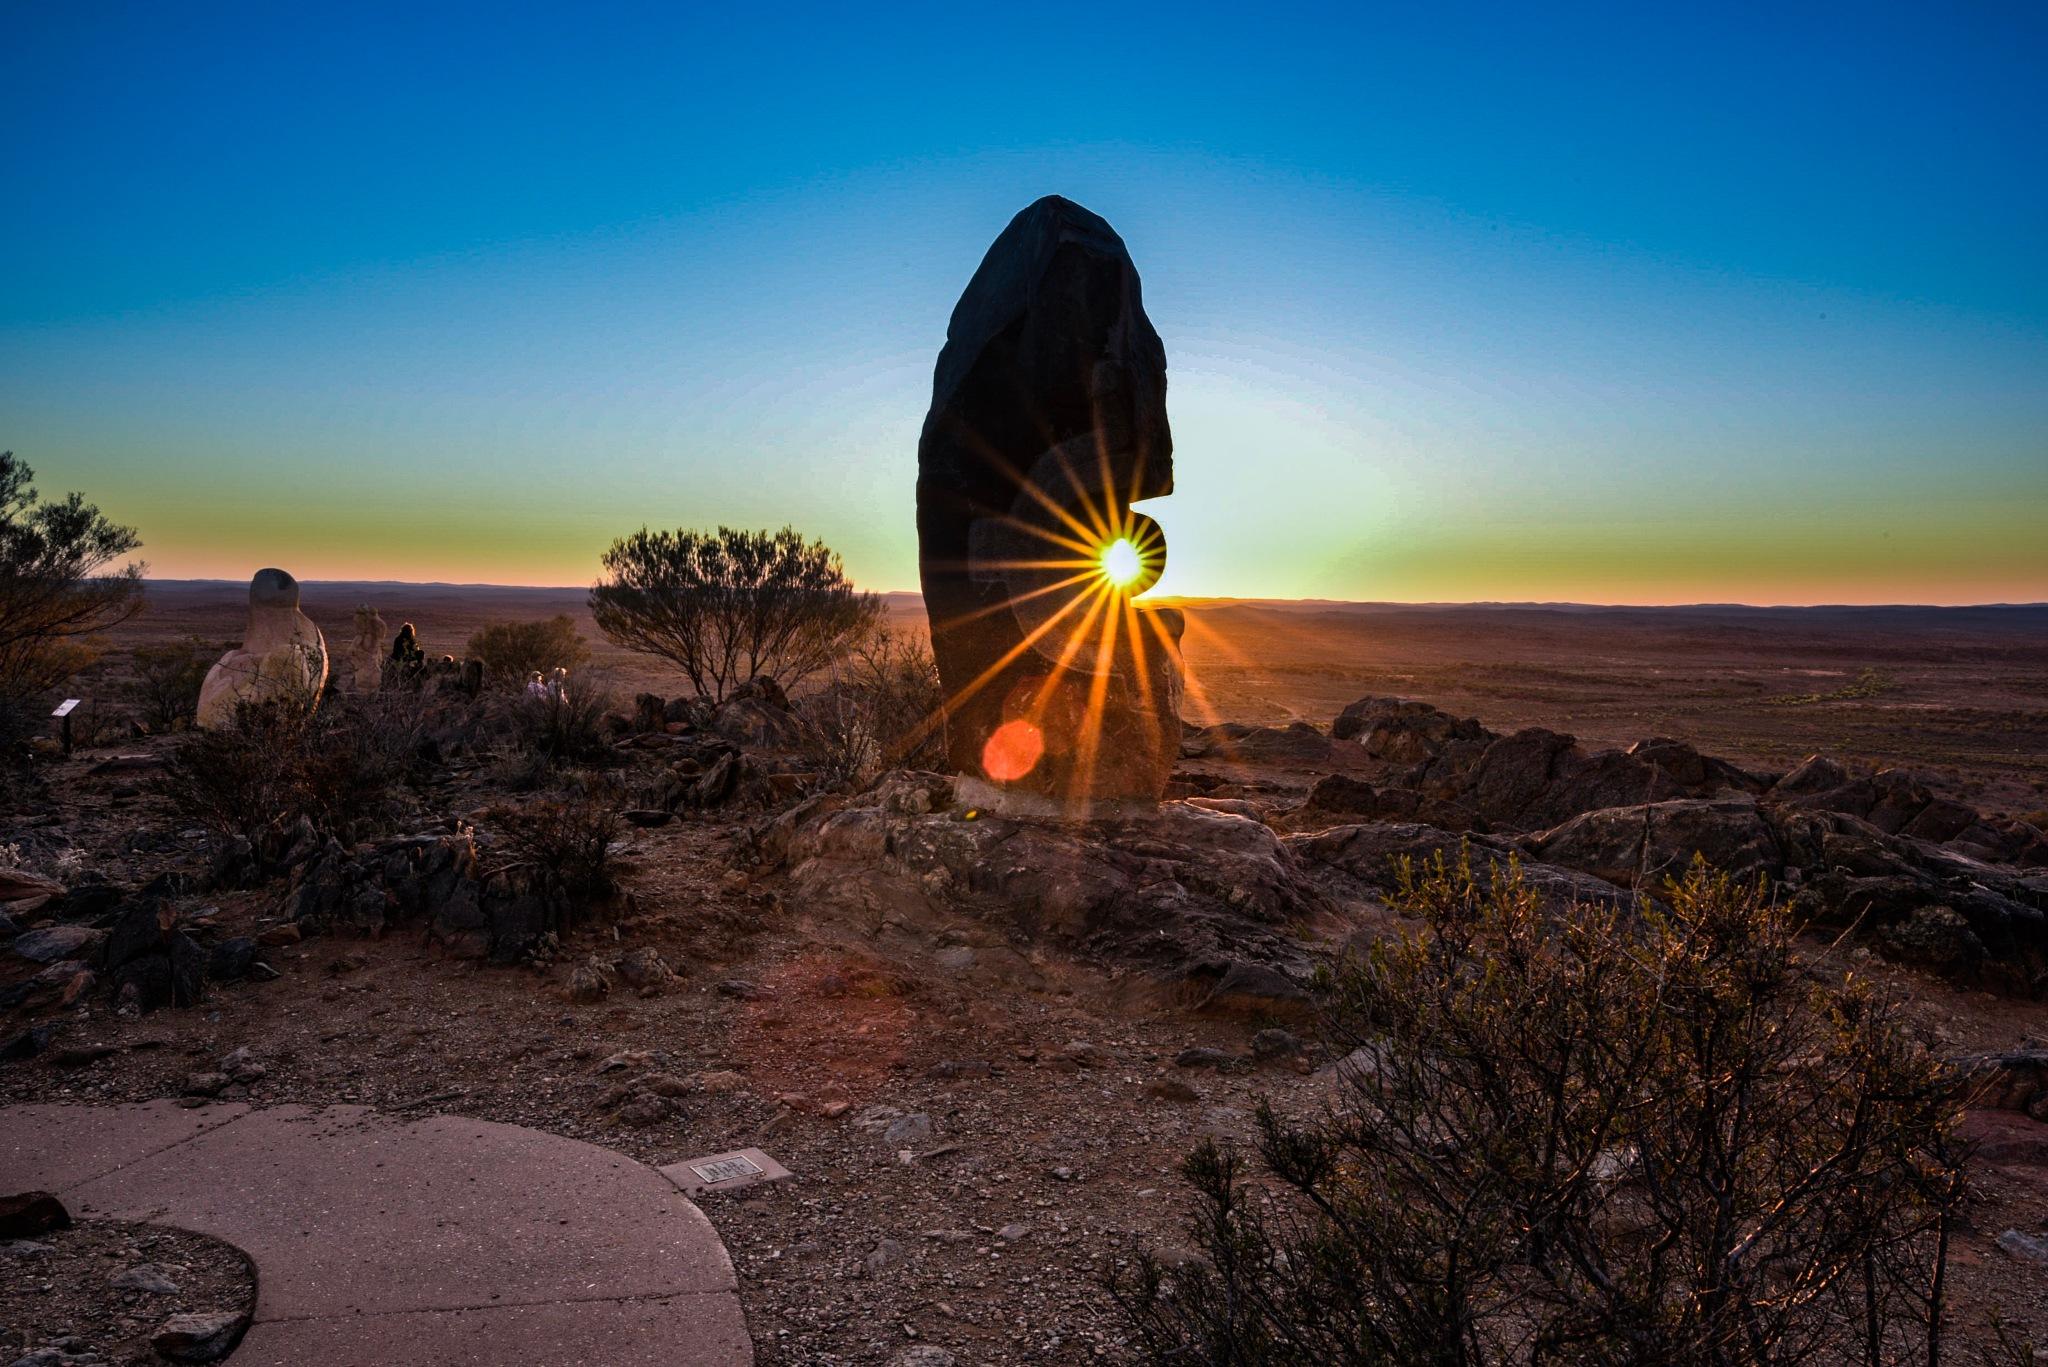 Sunflare through the living sculptures exhibition at Broken Hill by Trevor McKinnon